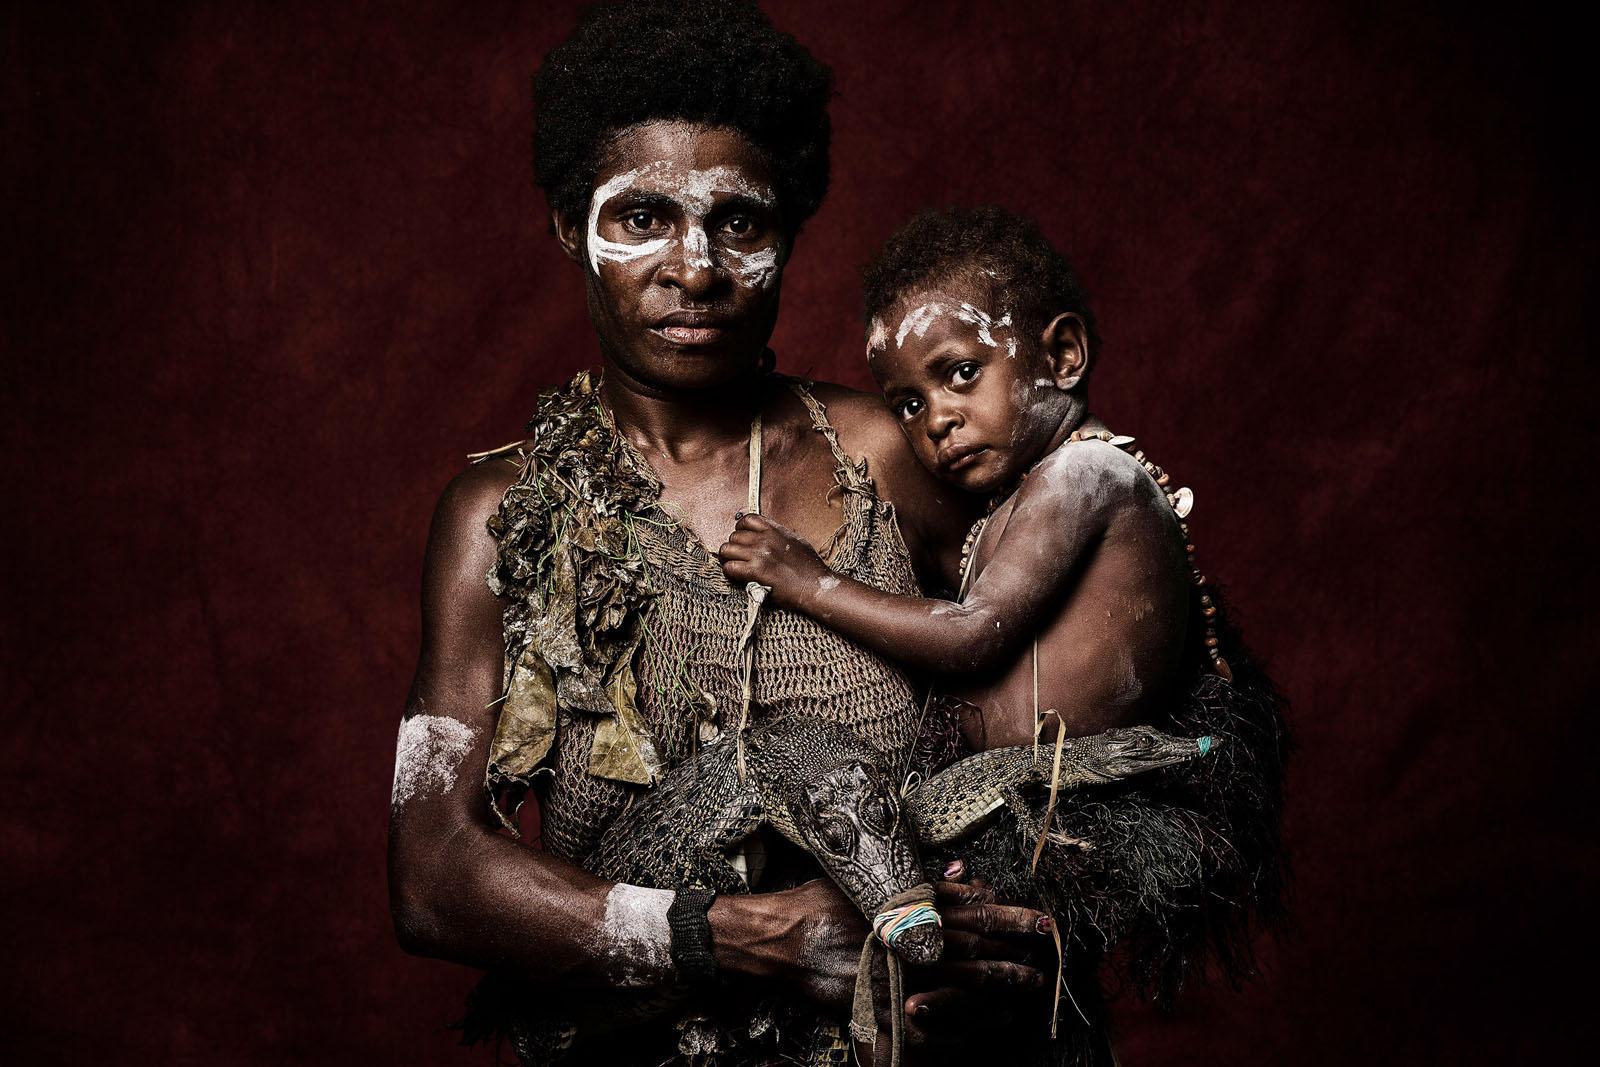 Sandro Miller: I am Papua New Guinea